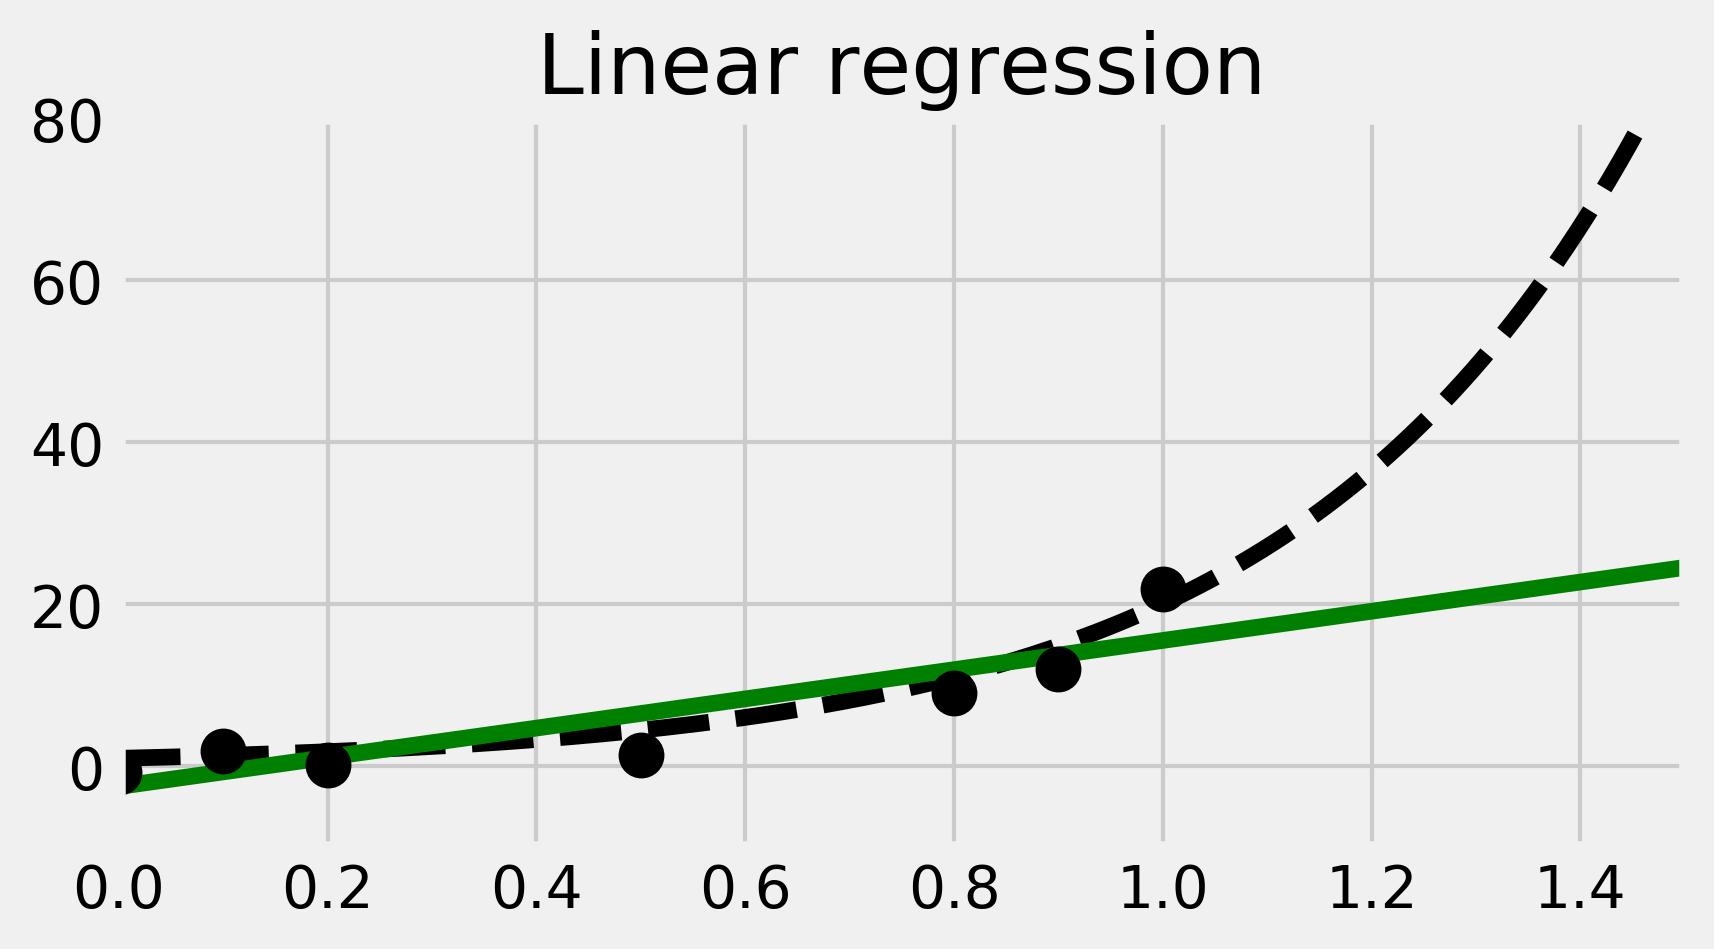 <matplotlib.figure.Figure at 0x82eae10>